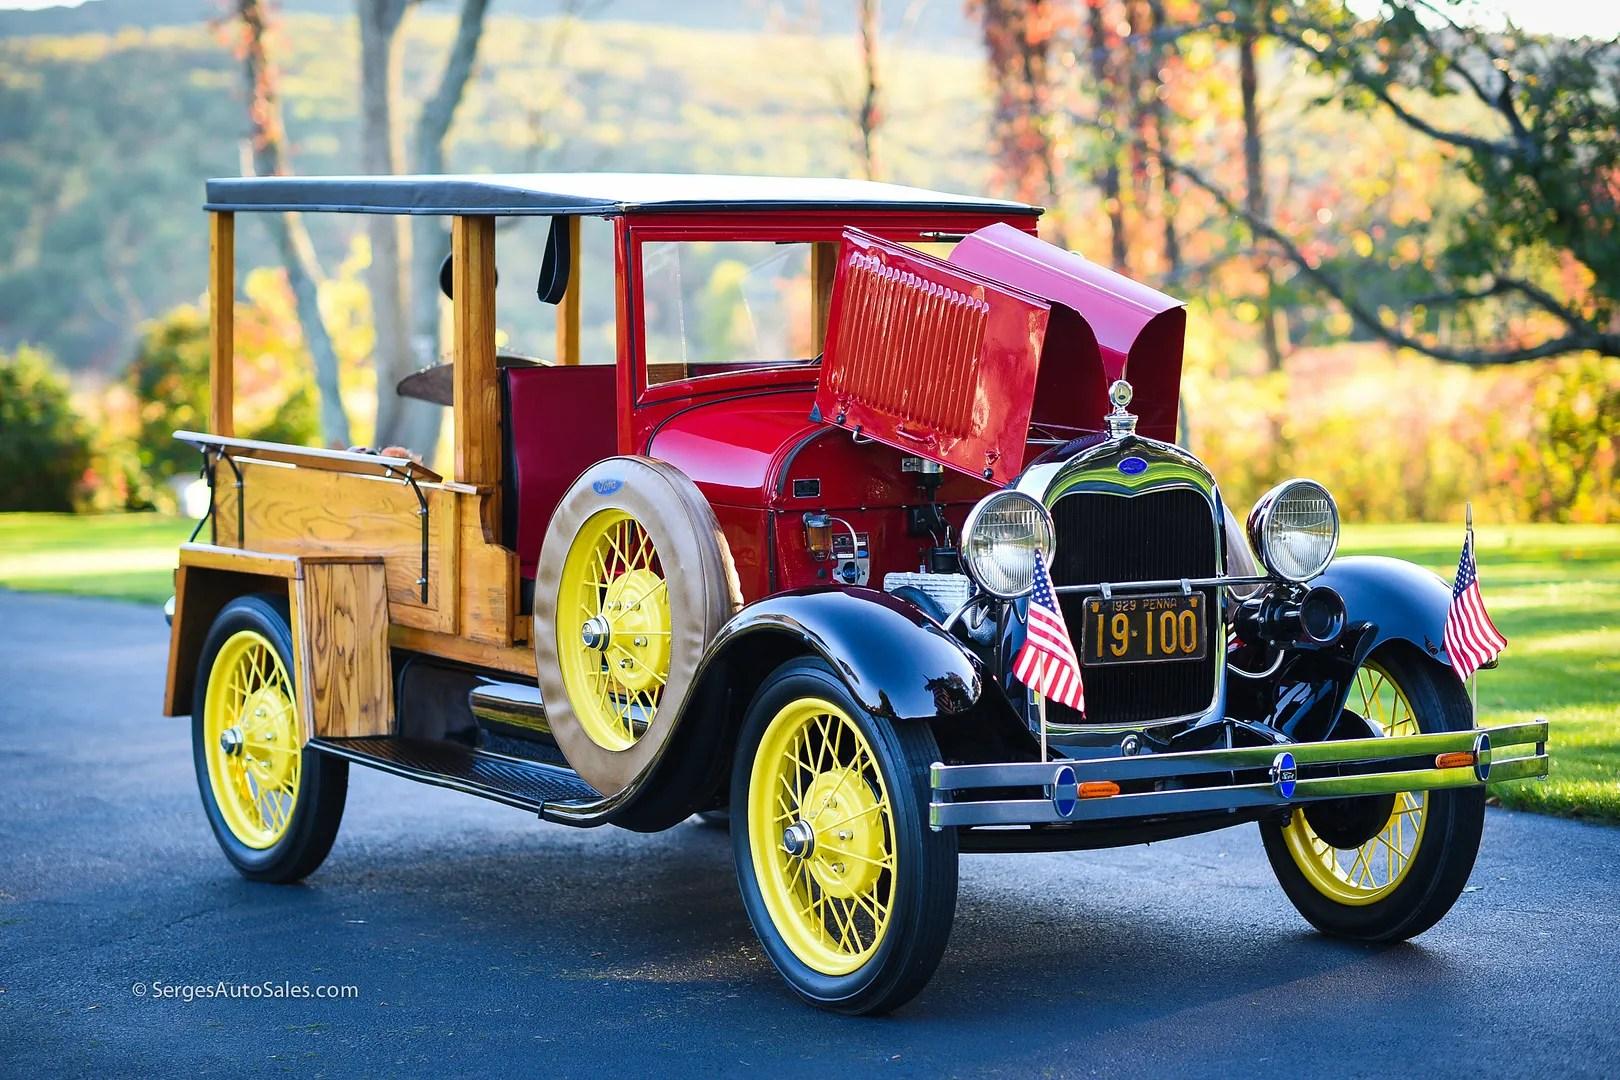 photo 1929-Ford-Model-A-Huckster-for-sale-serges-auto-sales-northeast-pennsylvania-scranton-muscle-cars-corvettes--56_zps1b15ffan.jpg